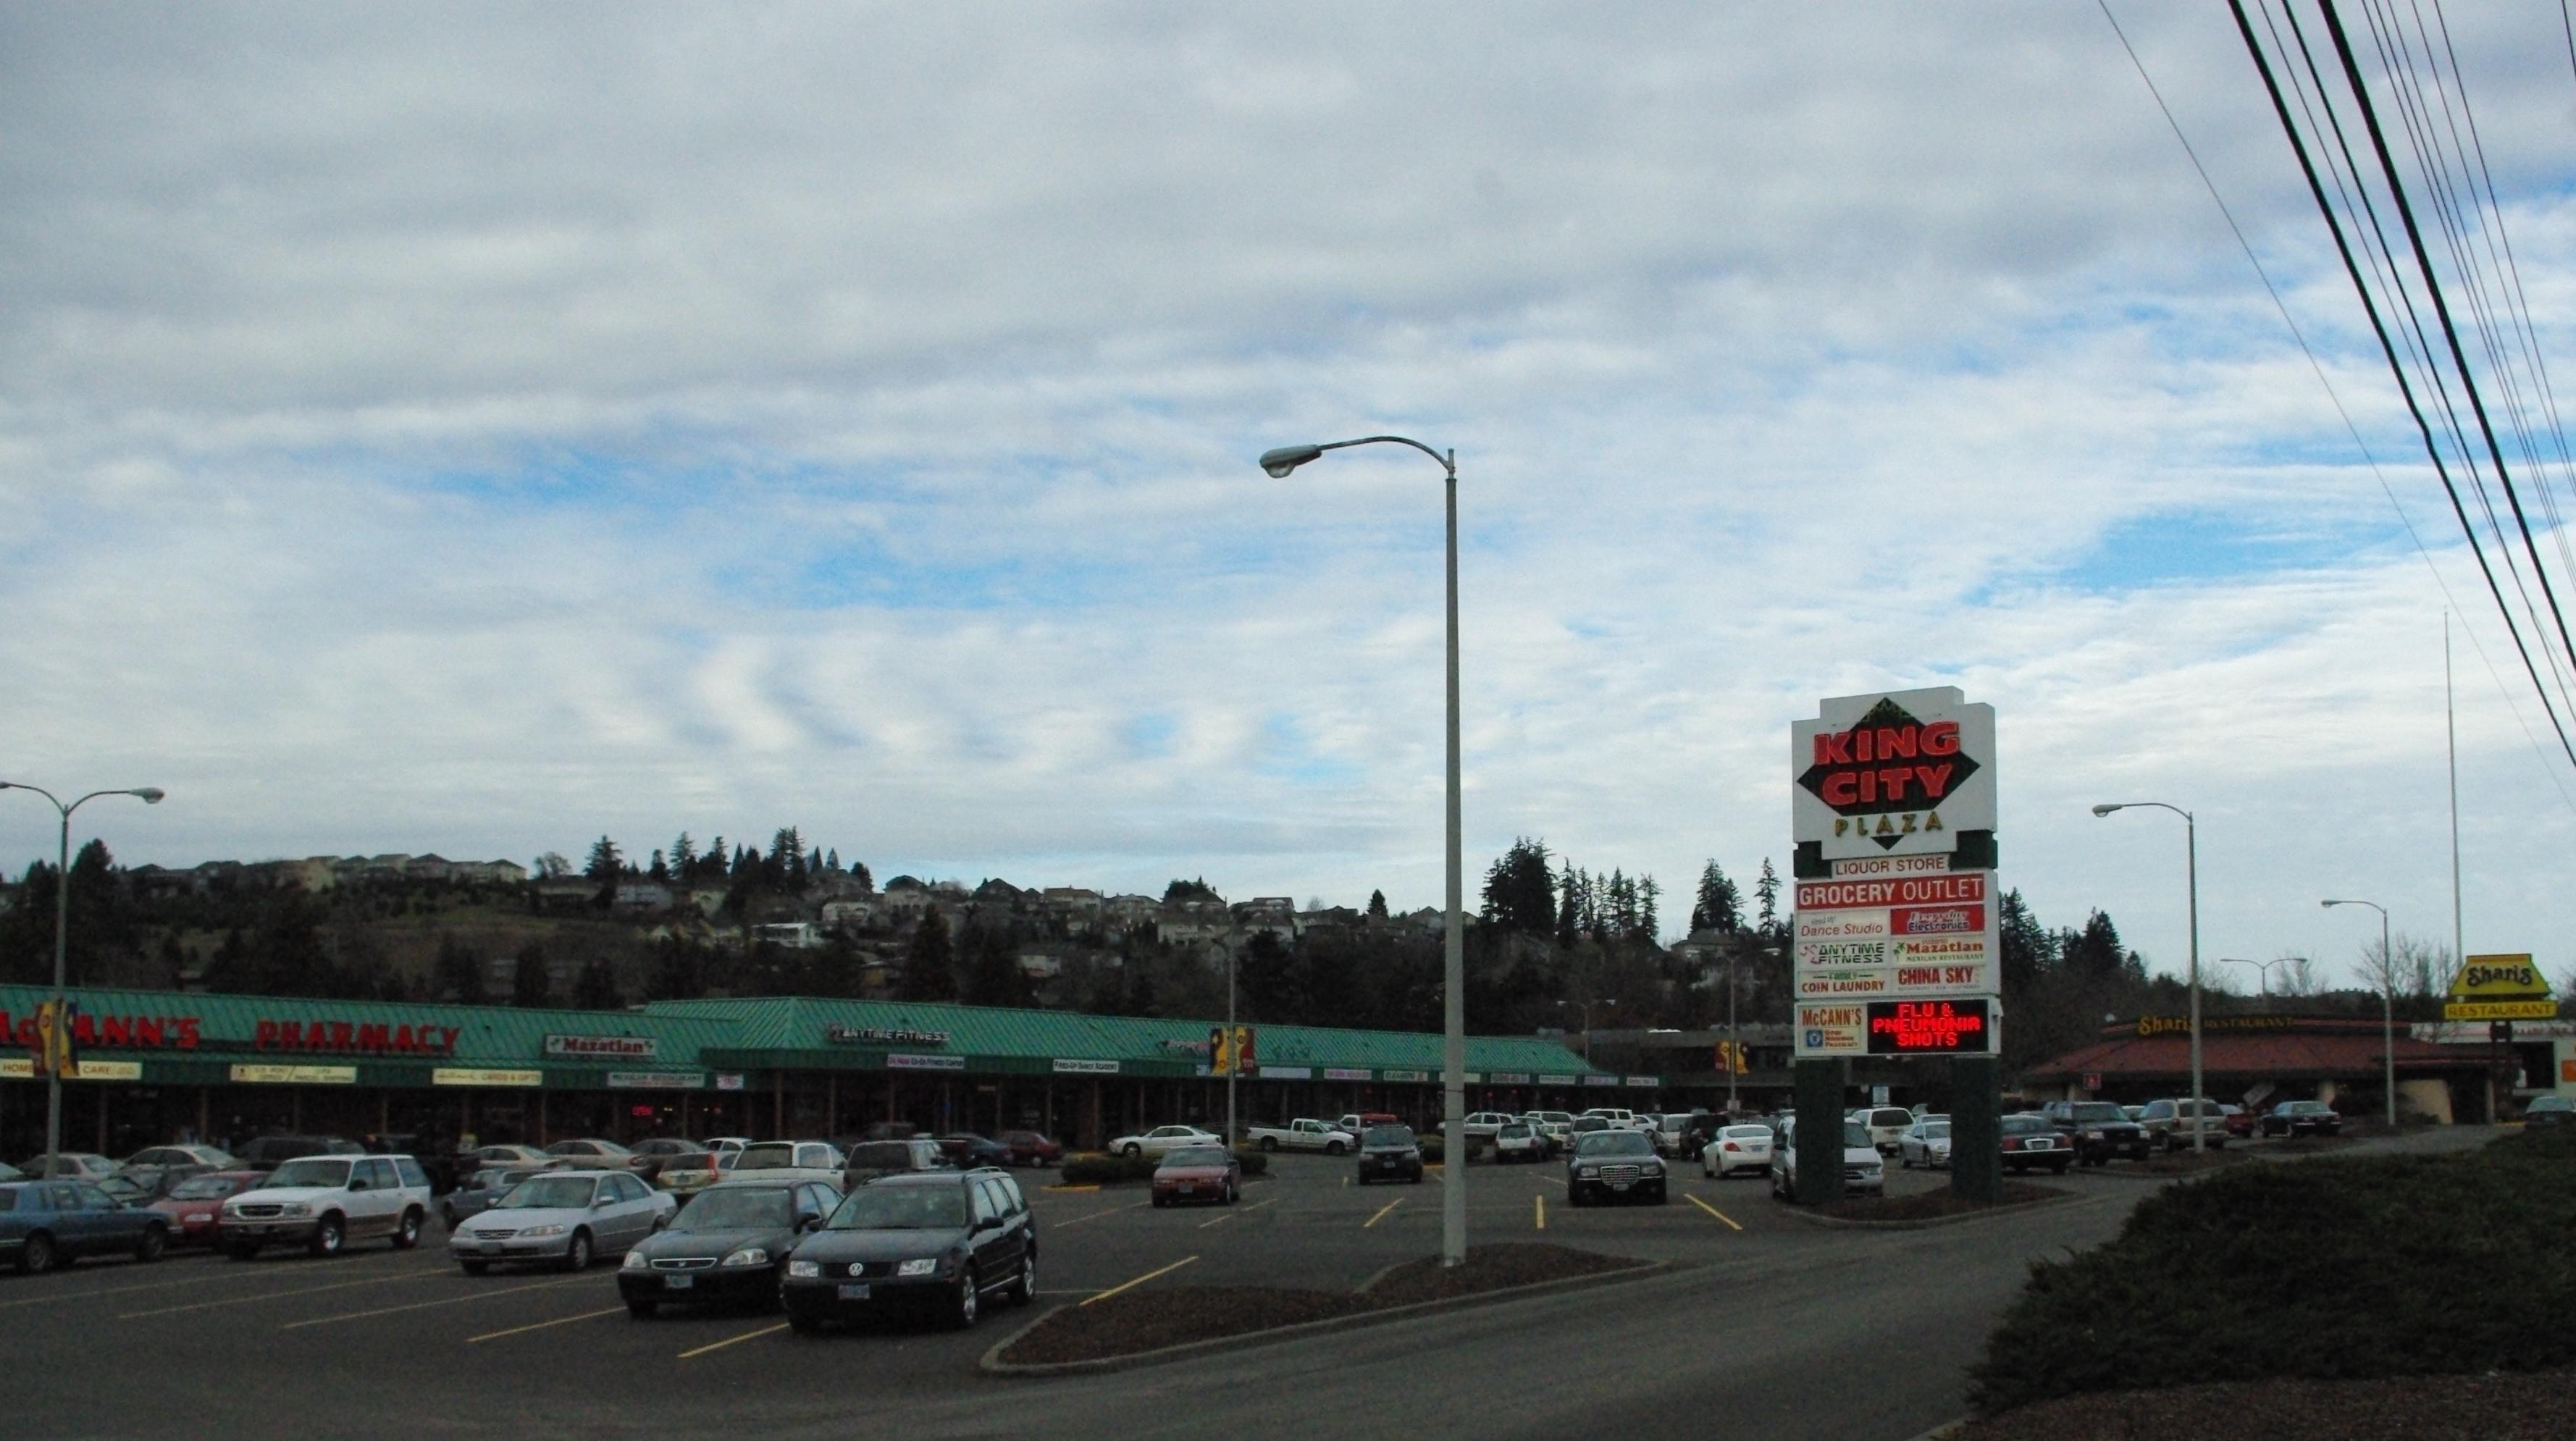 File:King City Oregon strip mall.JPG - Wikimedia Commons